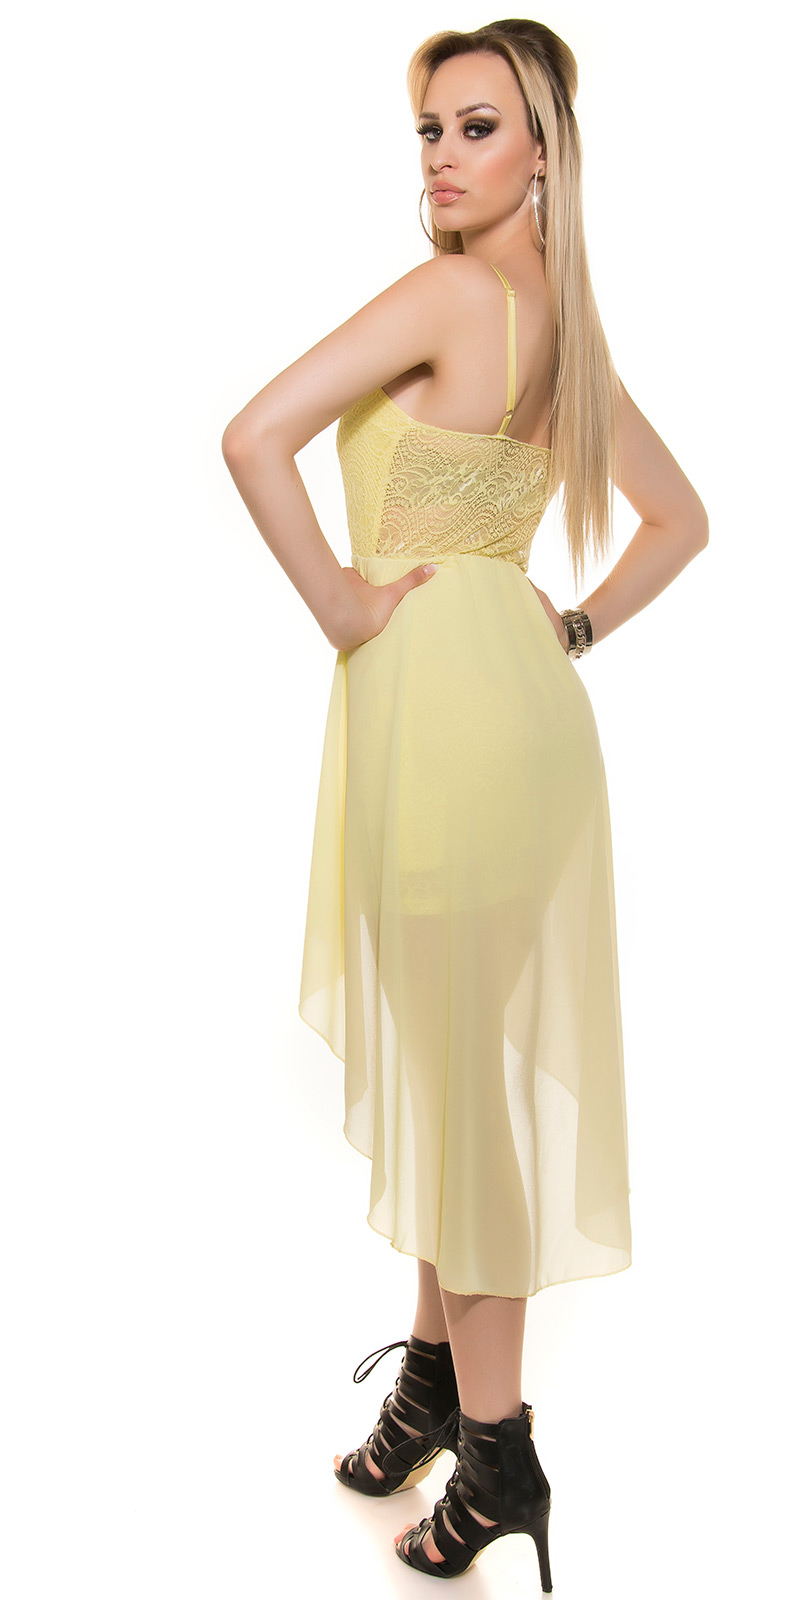 KouCla HighLow Kleid Spitze Chiffon Abendkleid Vokuhila Minikleid ...